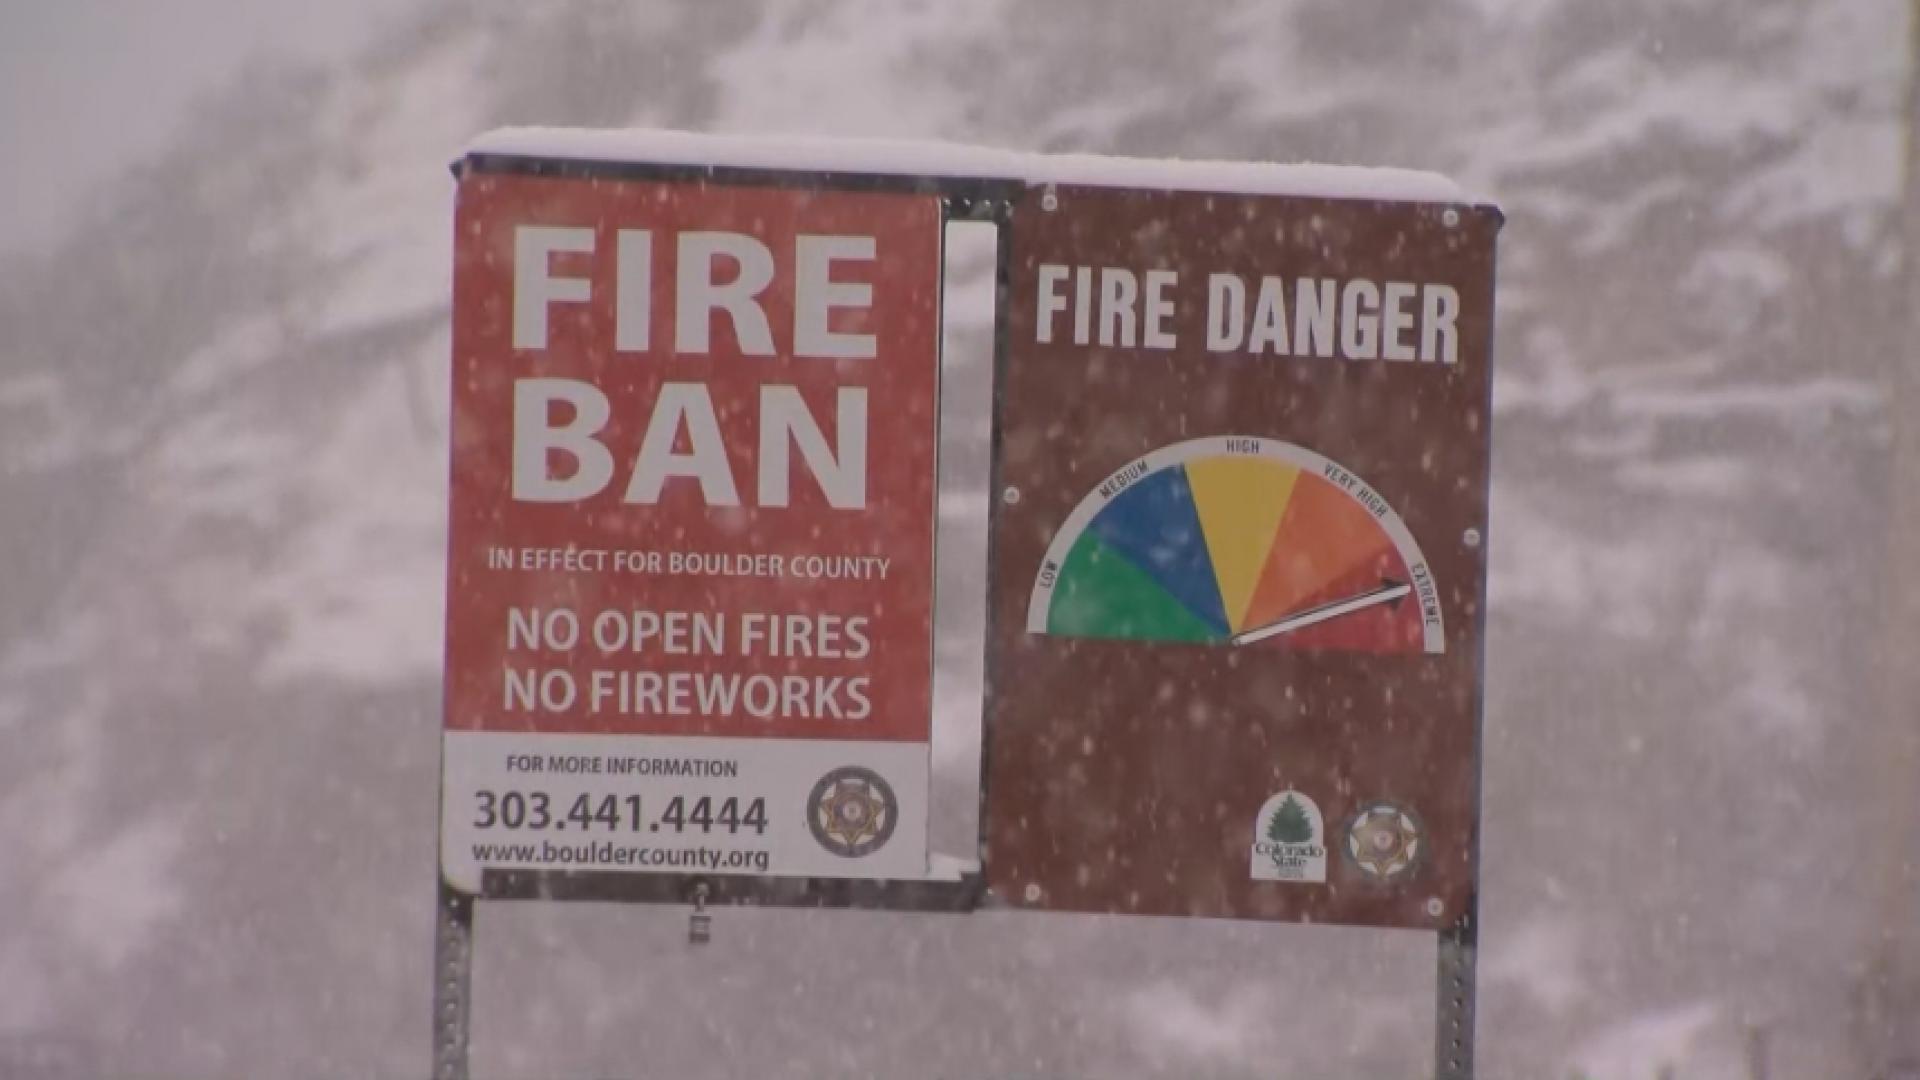 Snow 'eases' Colorado wildfire battle